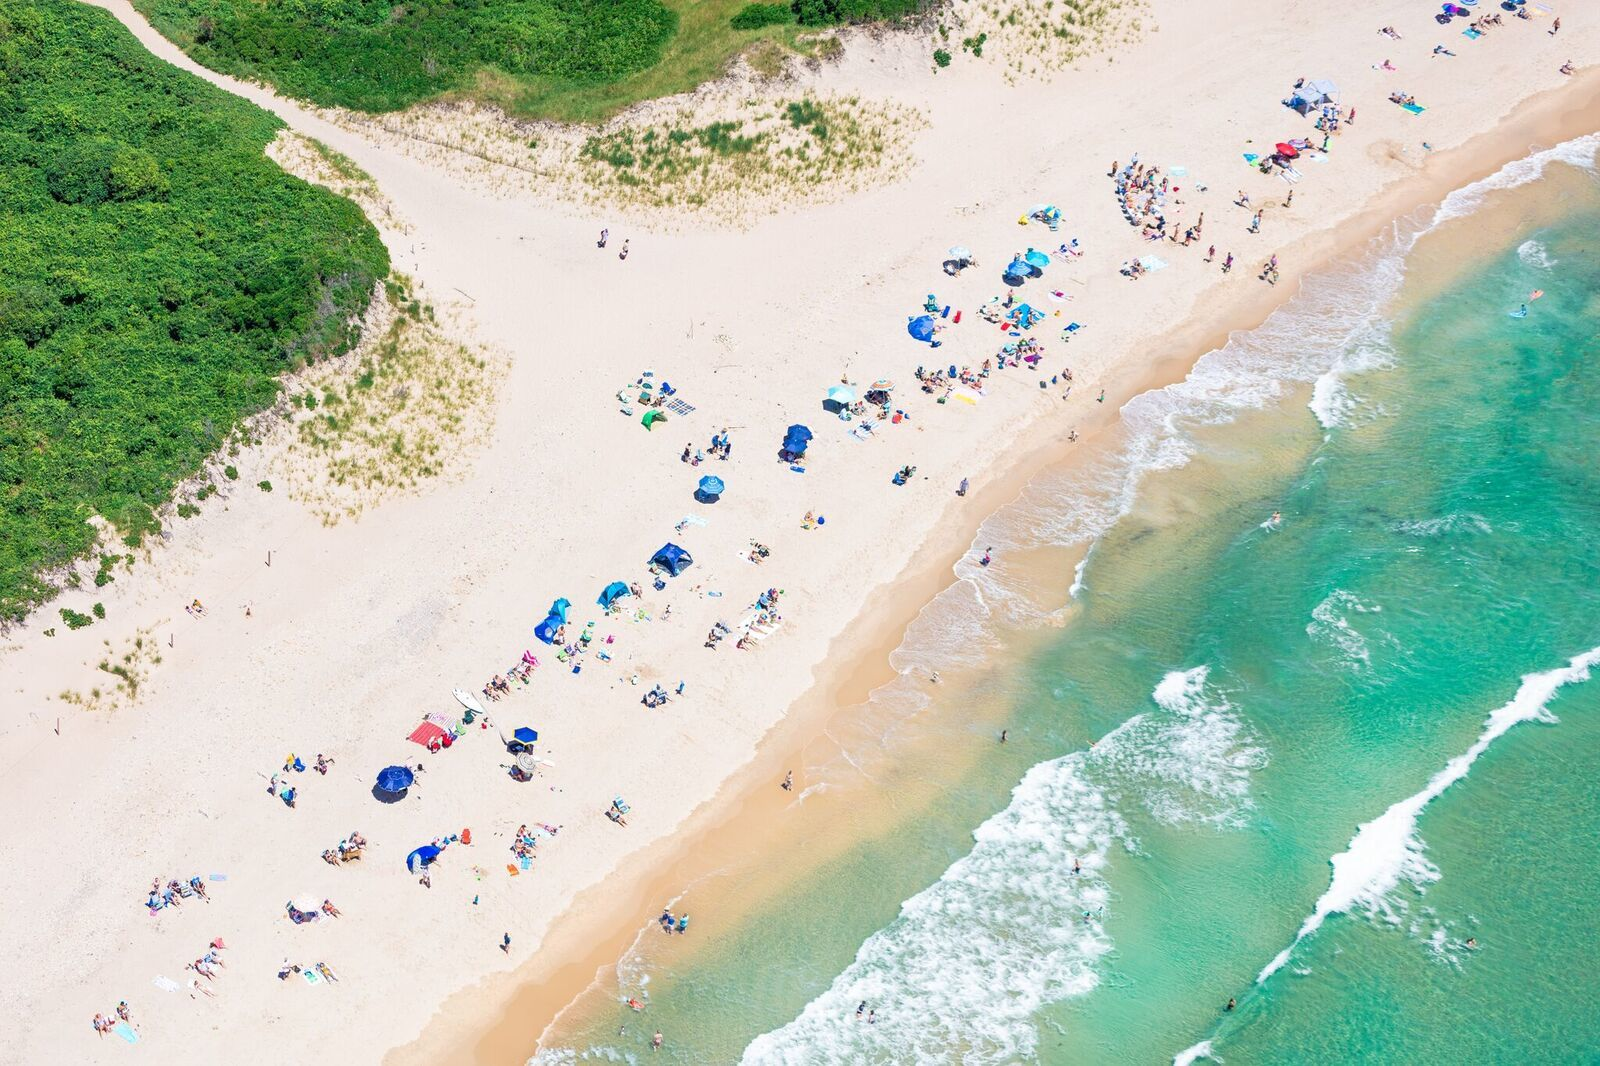 rhode island travel guide best beaches by gray malin gray malin rh graymalin com